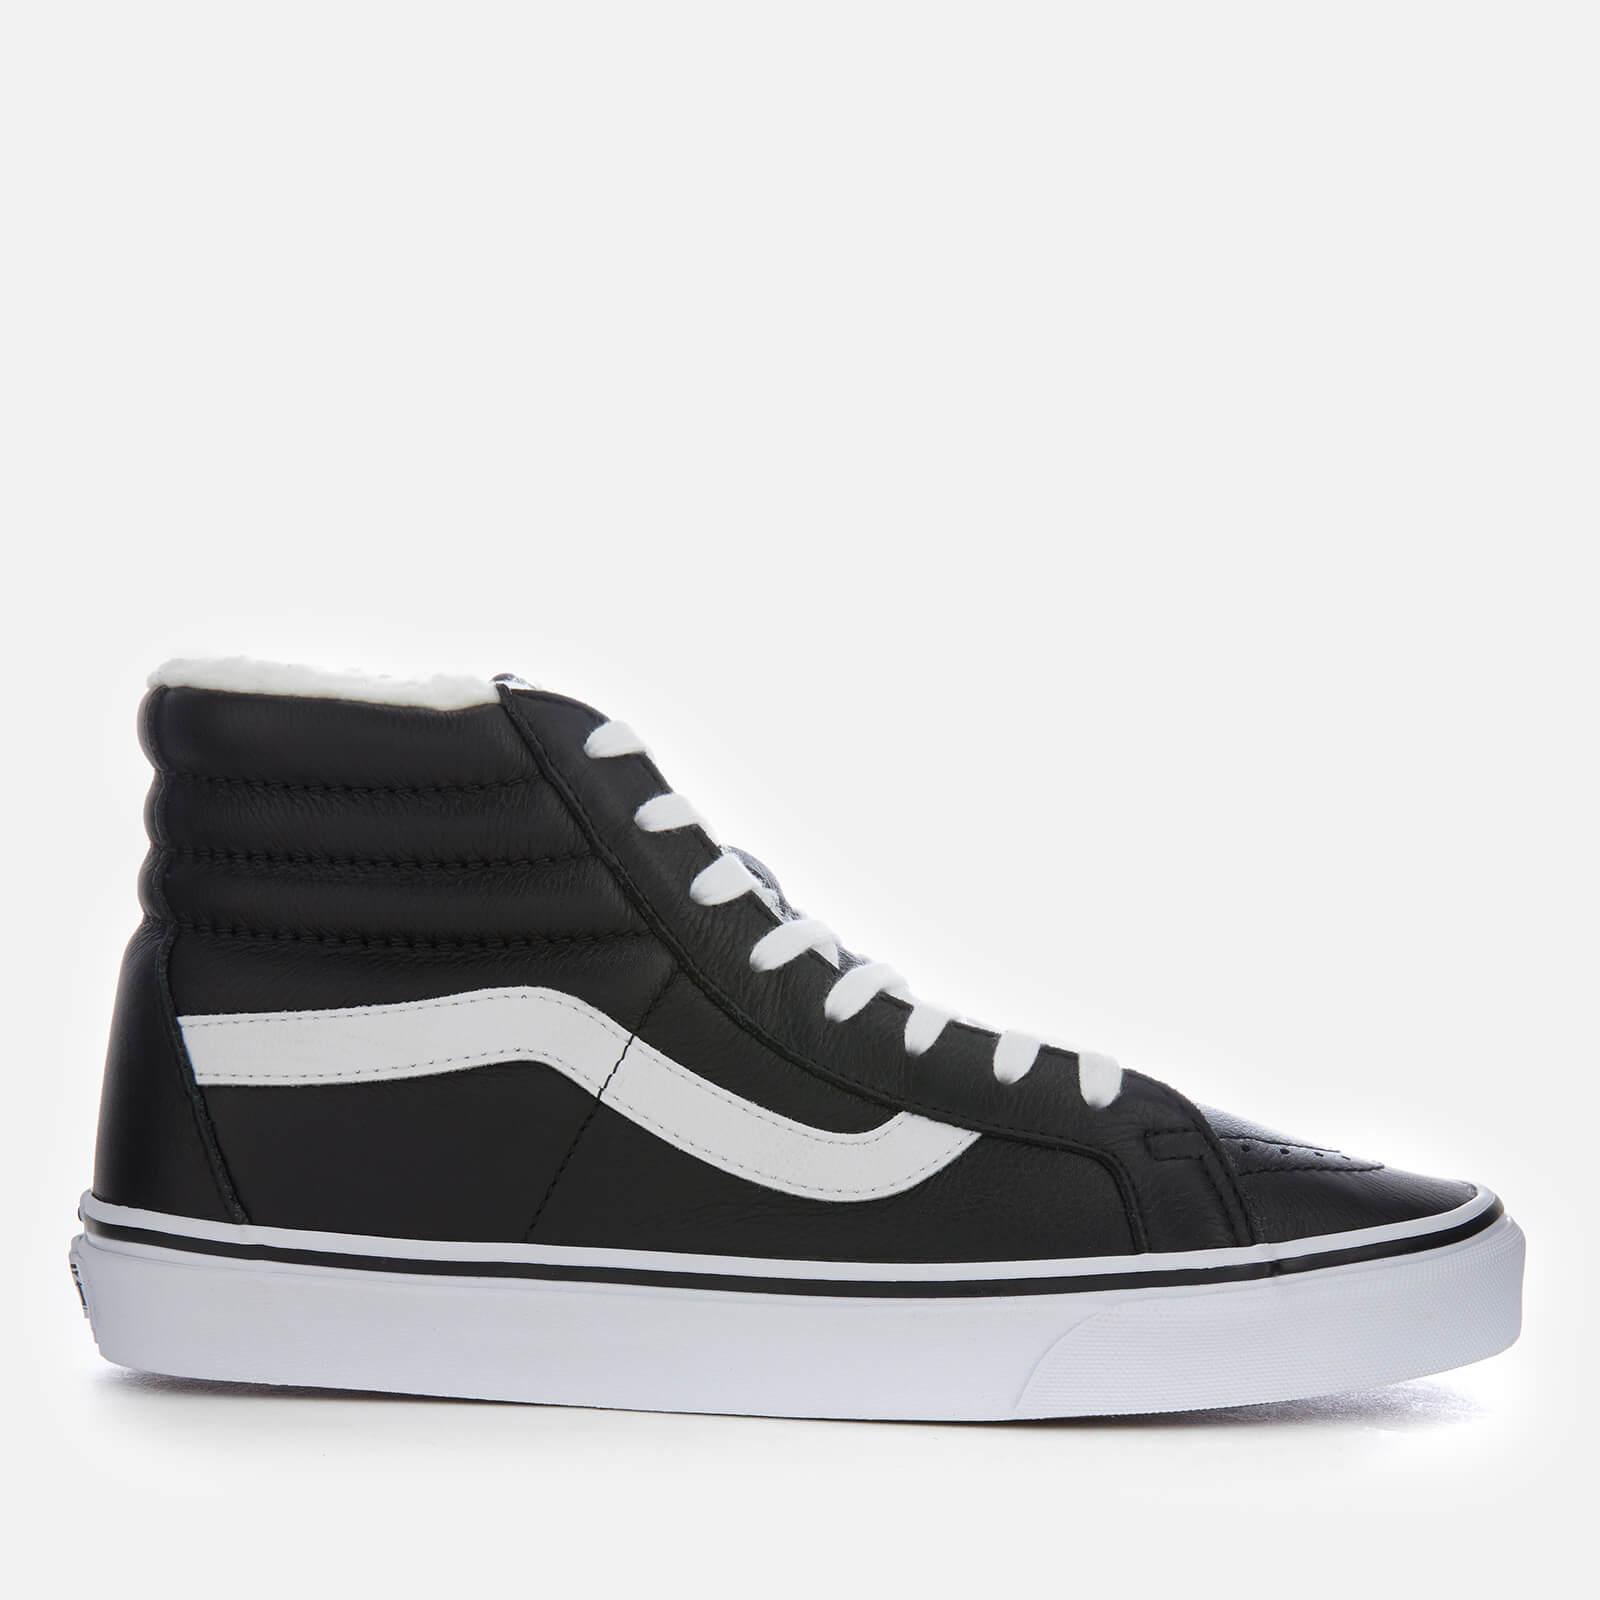 f8cf7125e5 Vans Men s Sk8-Hi Reissue Leather Fleece Trainers - Black True White  Clothing